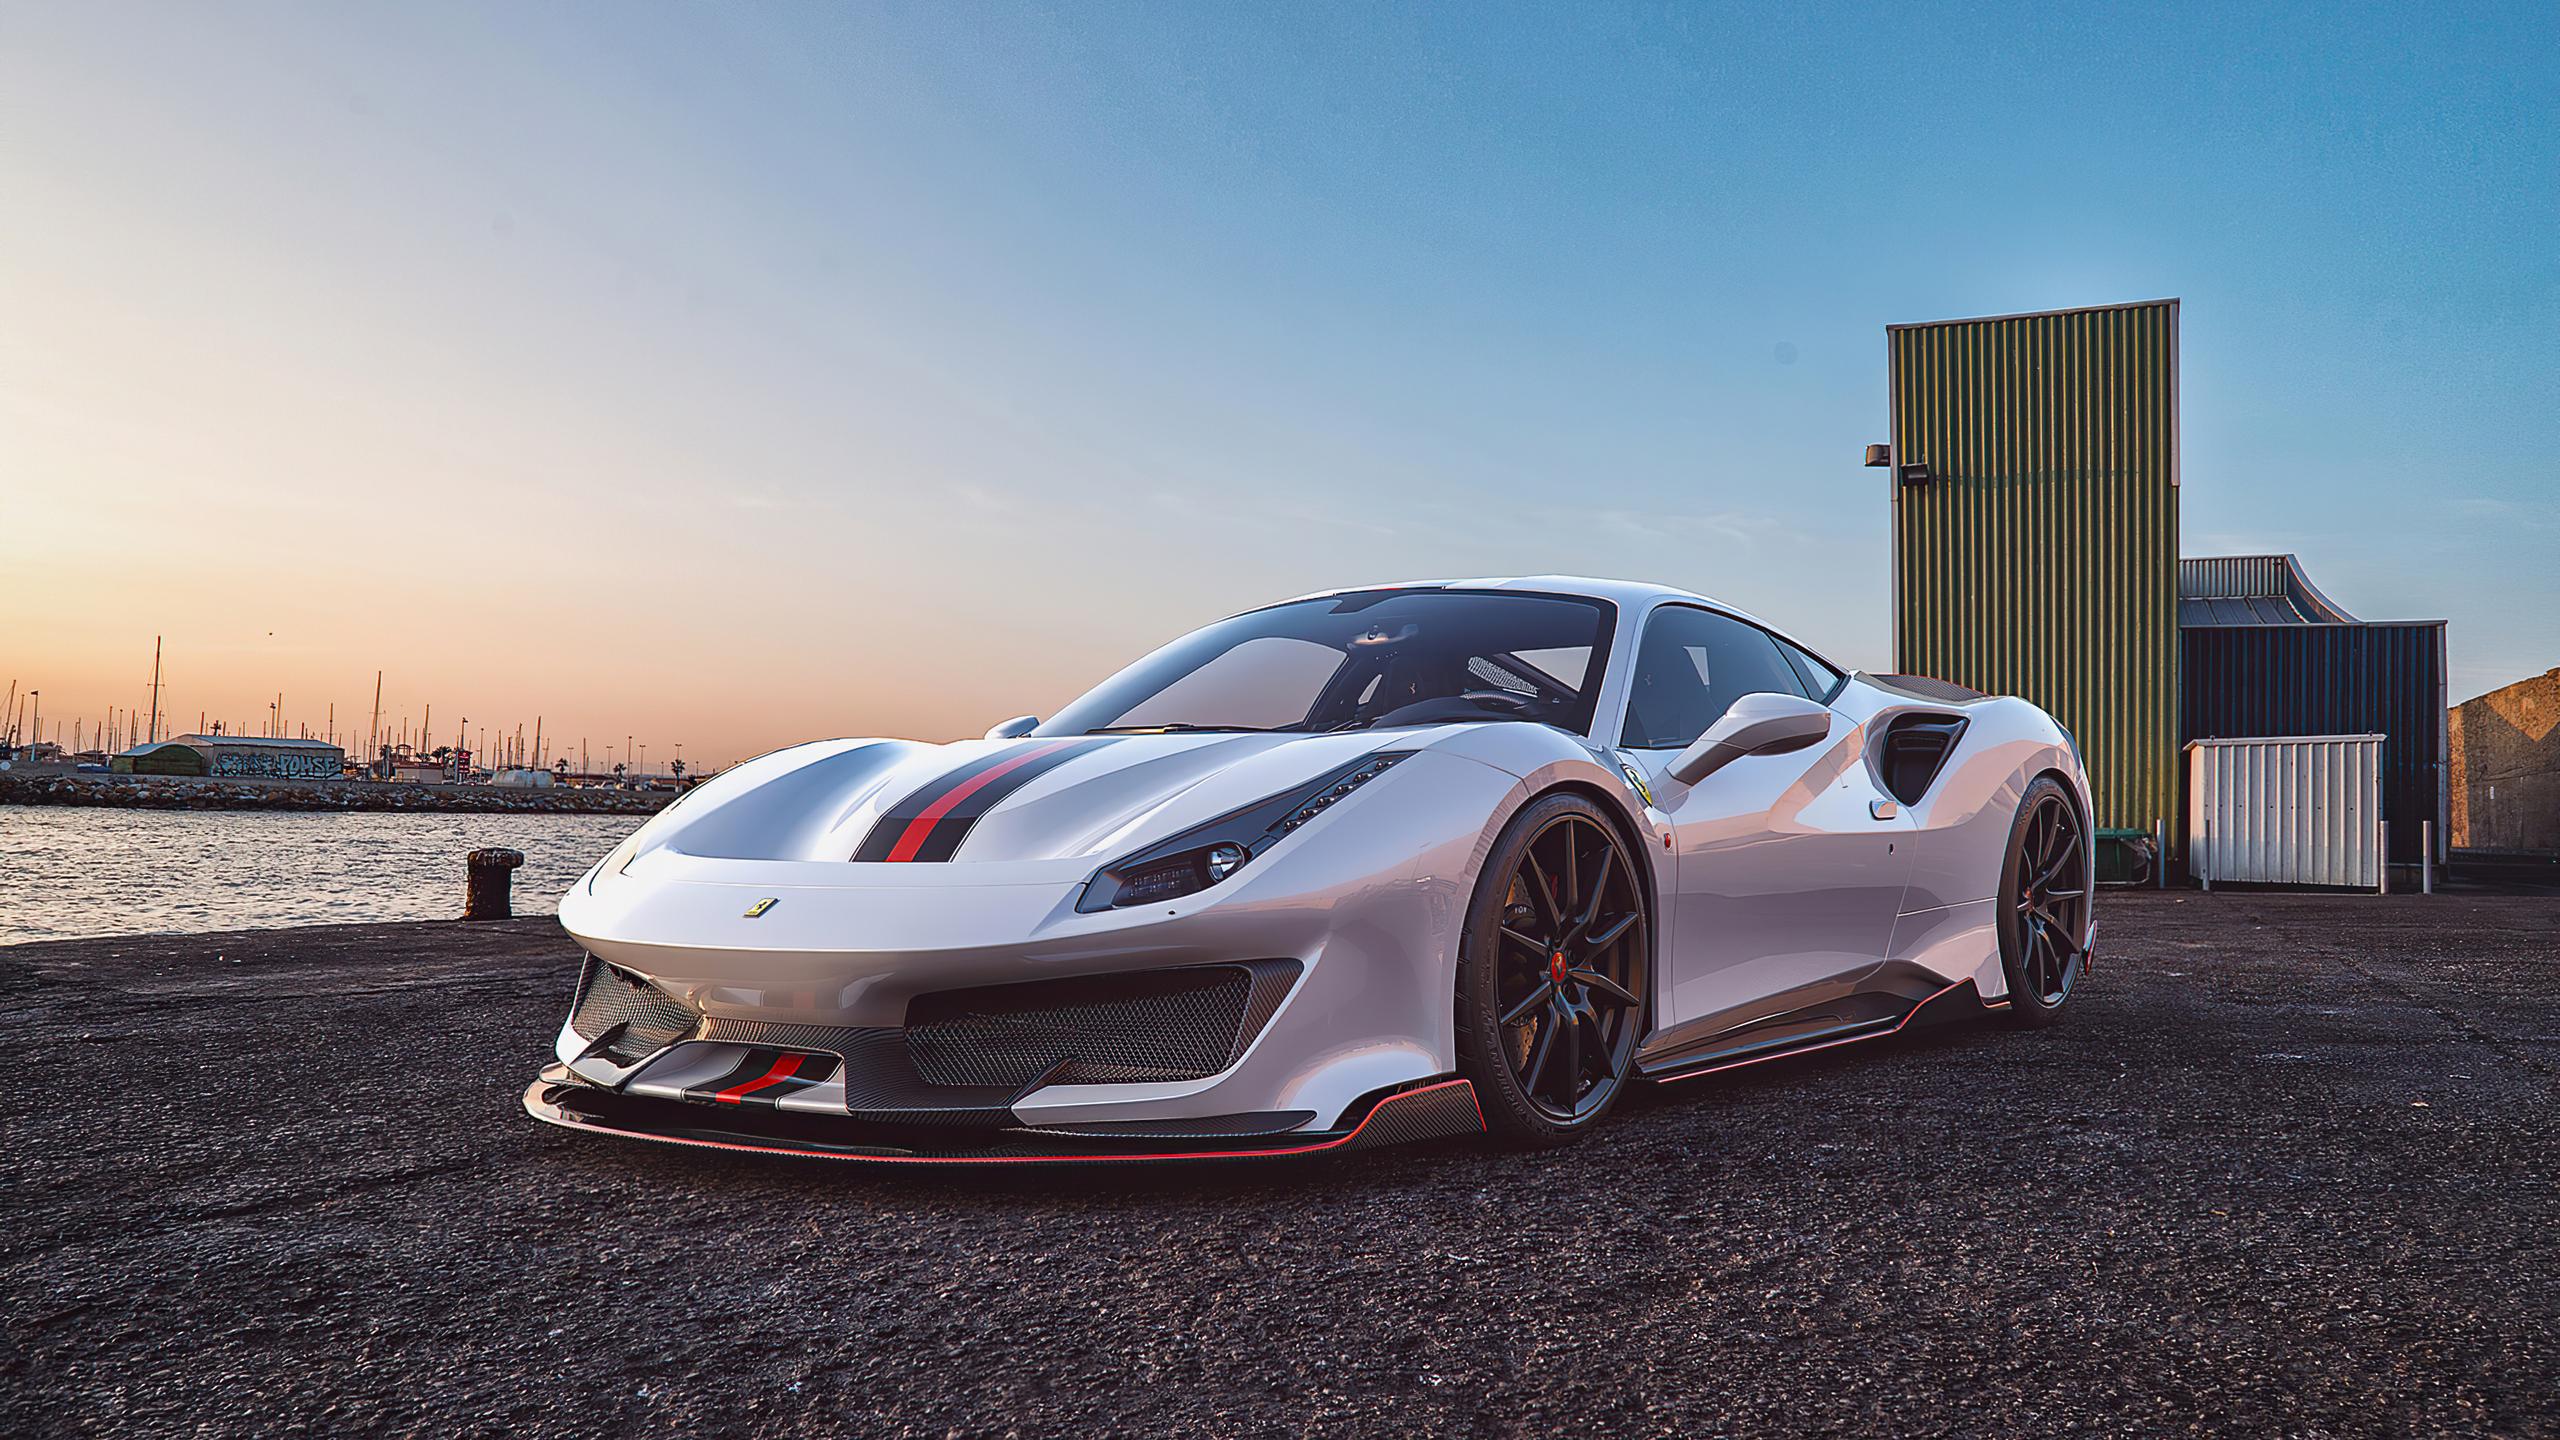 2560x1440 Ferrari 488 Pista Outdoor 1440P Resolution HD 4k ...